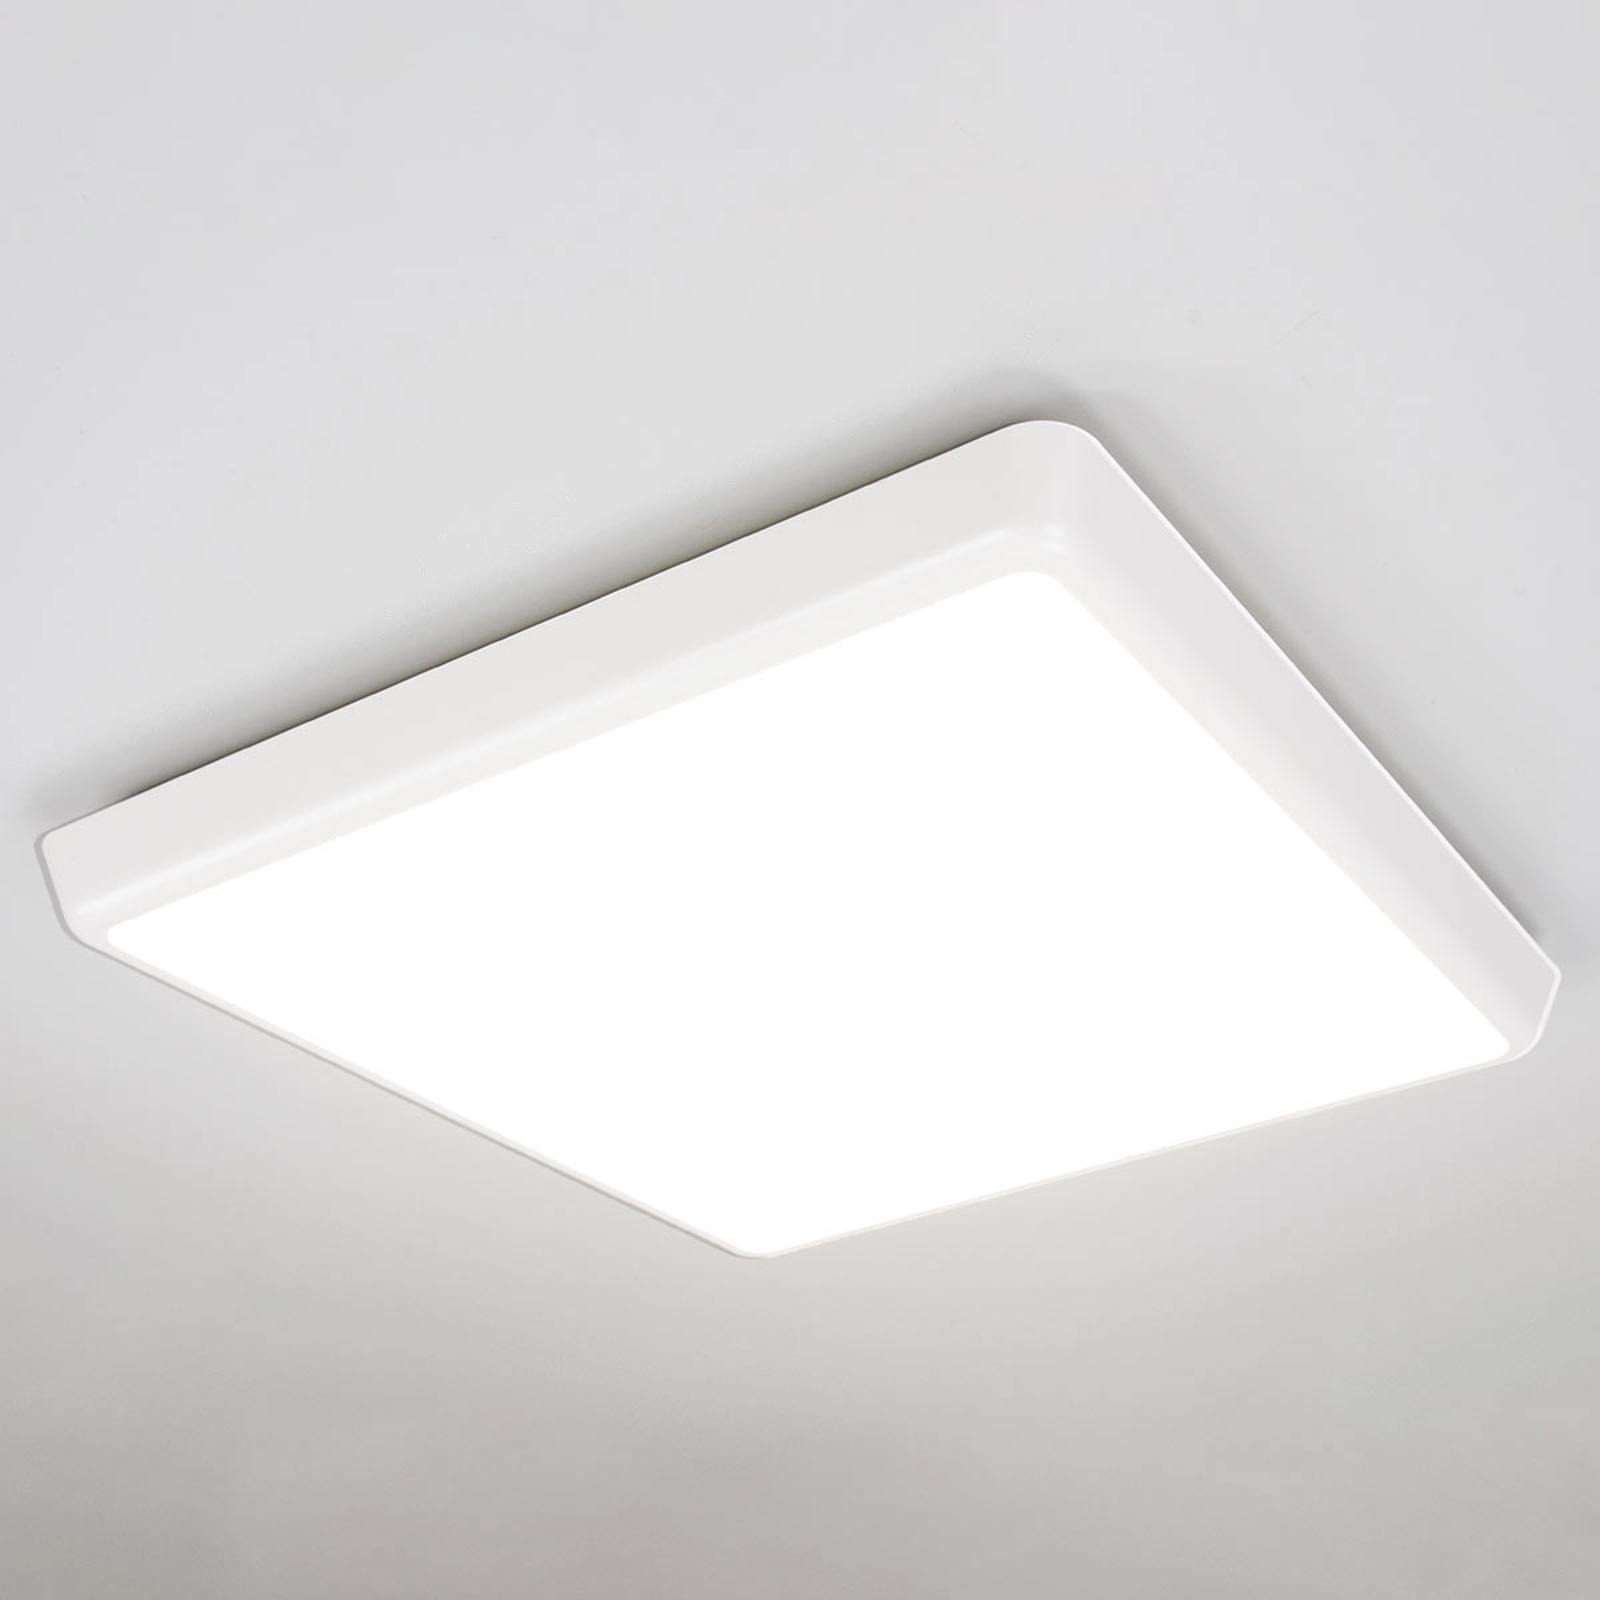 Discreto plafón LED Augustin, IP54 40 cm